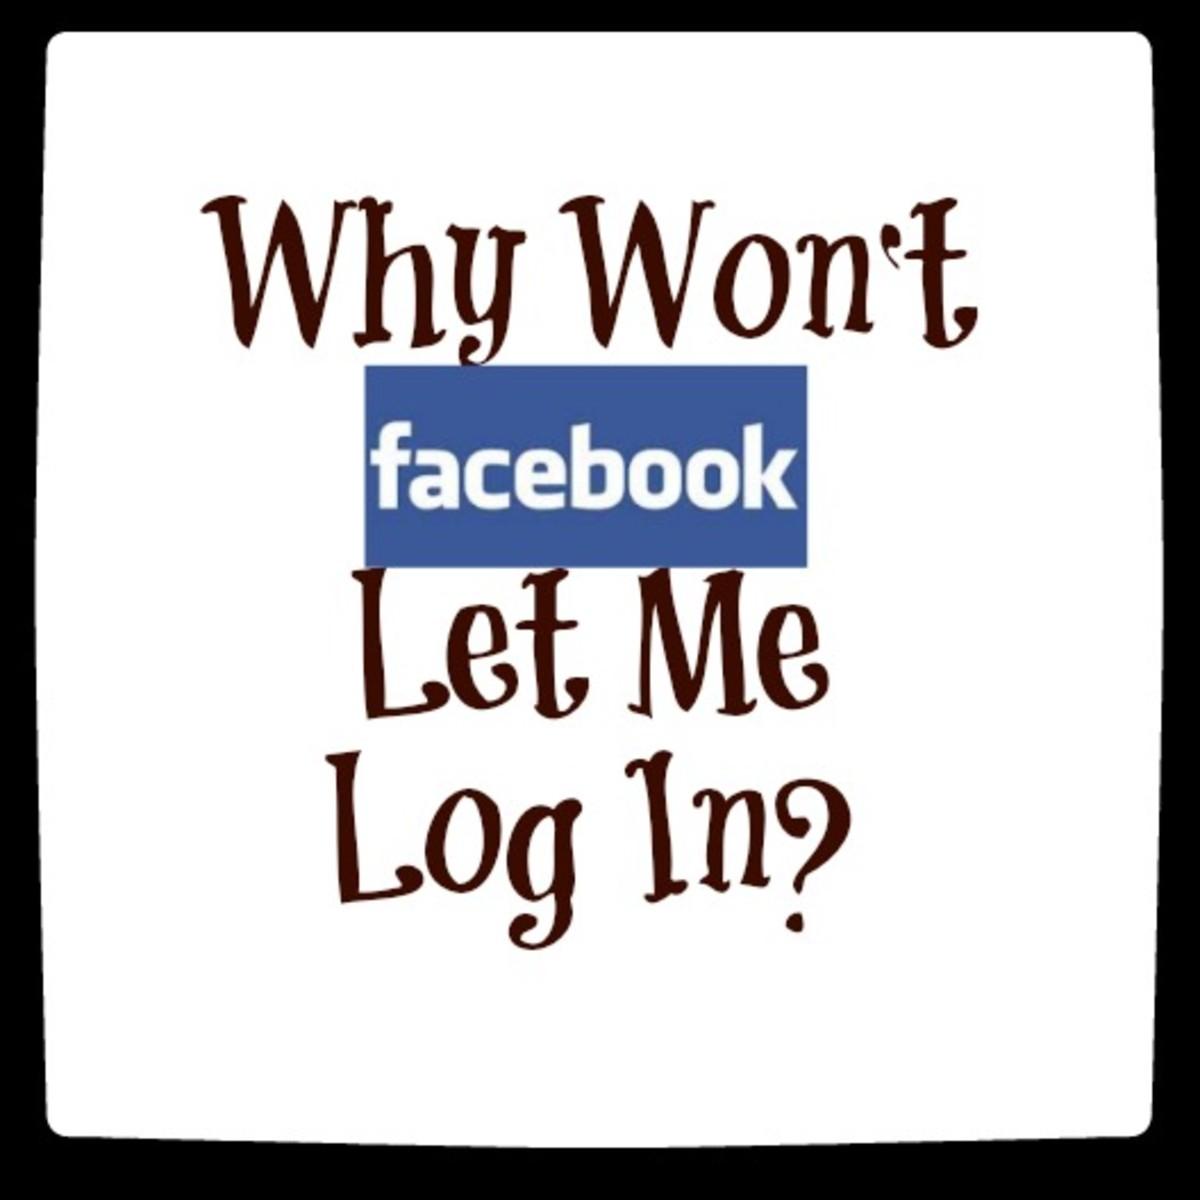 Why Won't Facebook Let Me Log In?